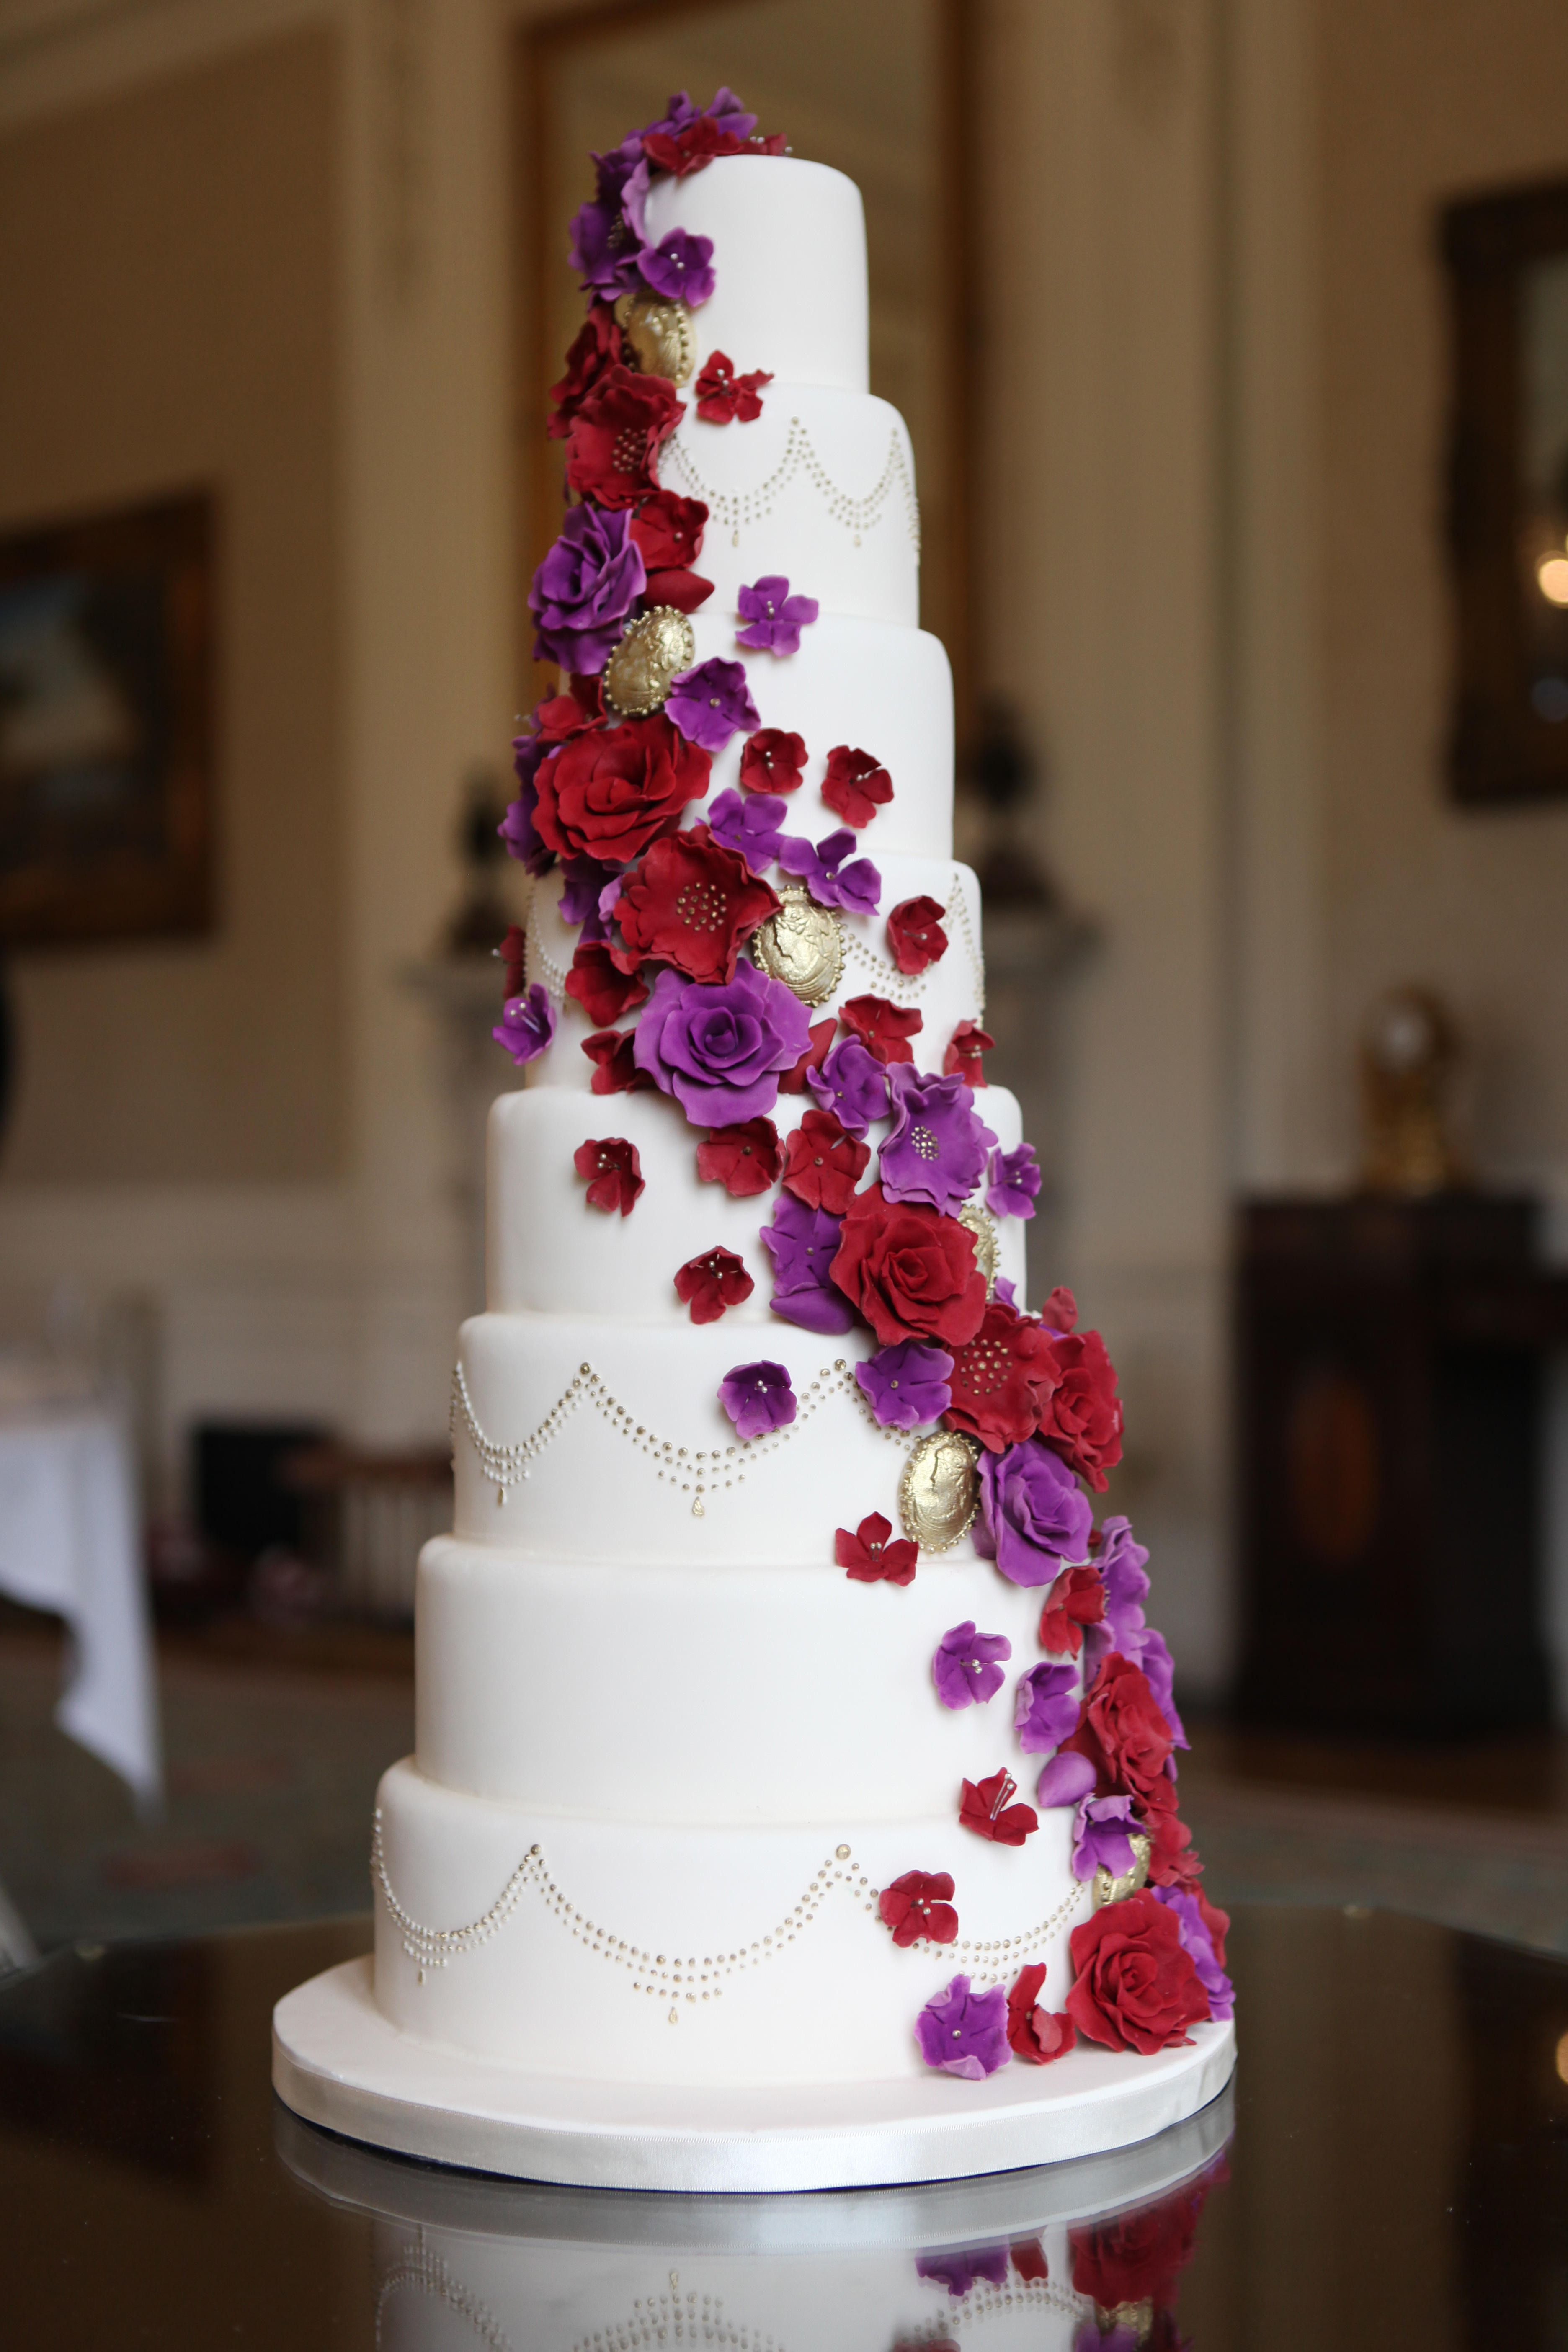 Asian cake design wedding